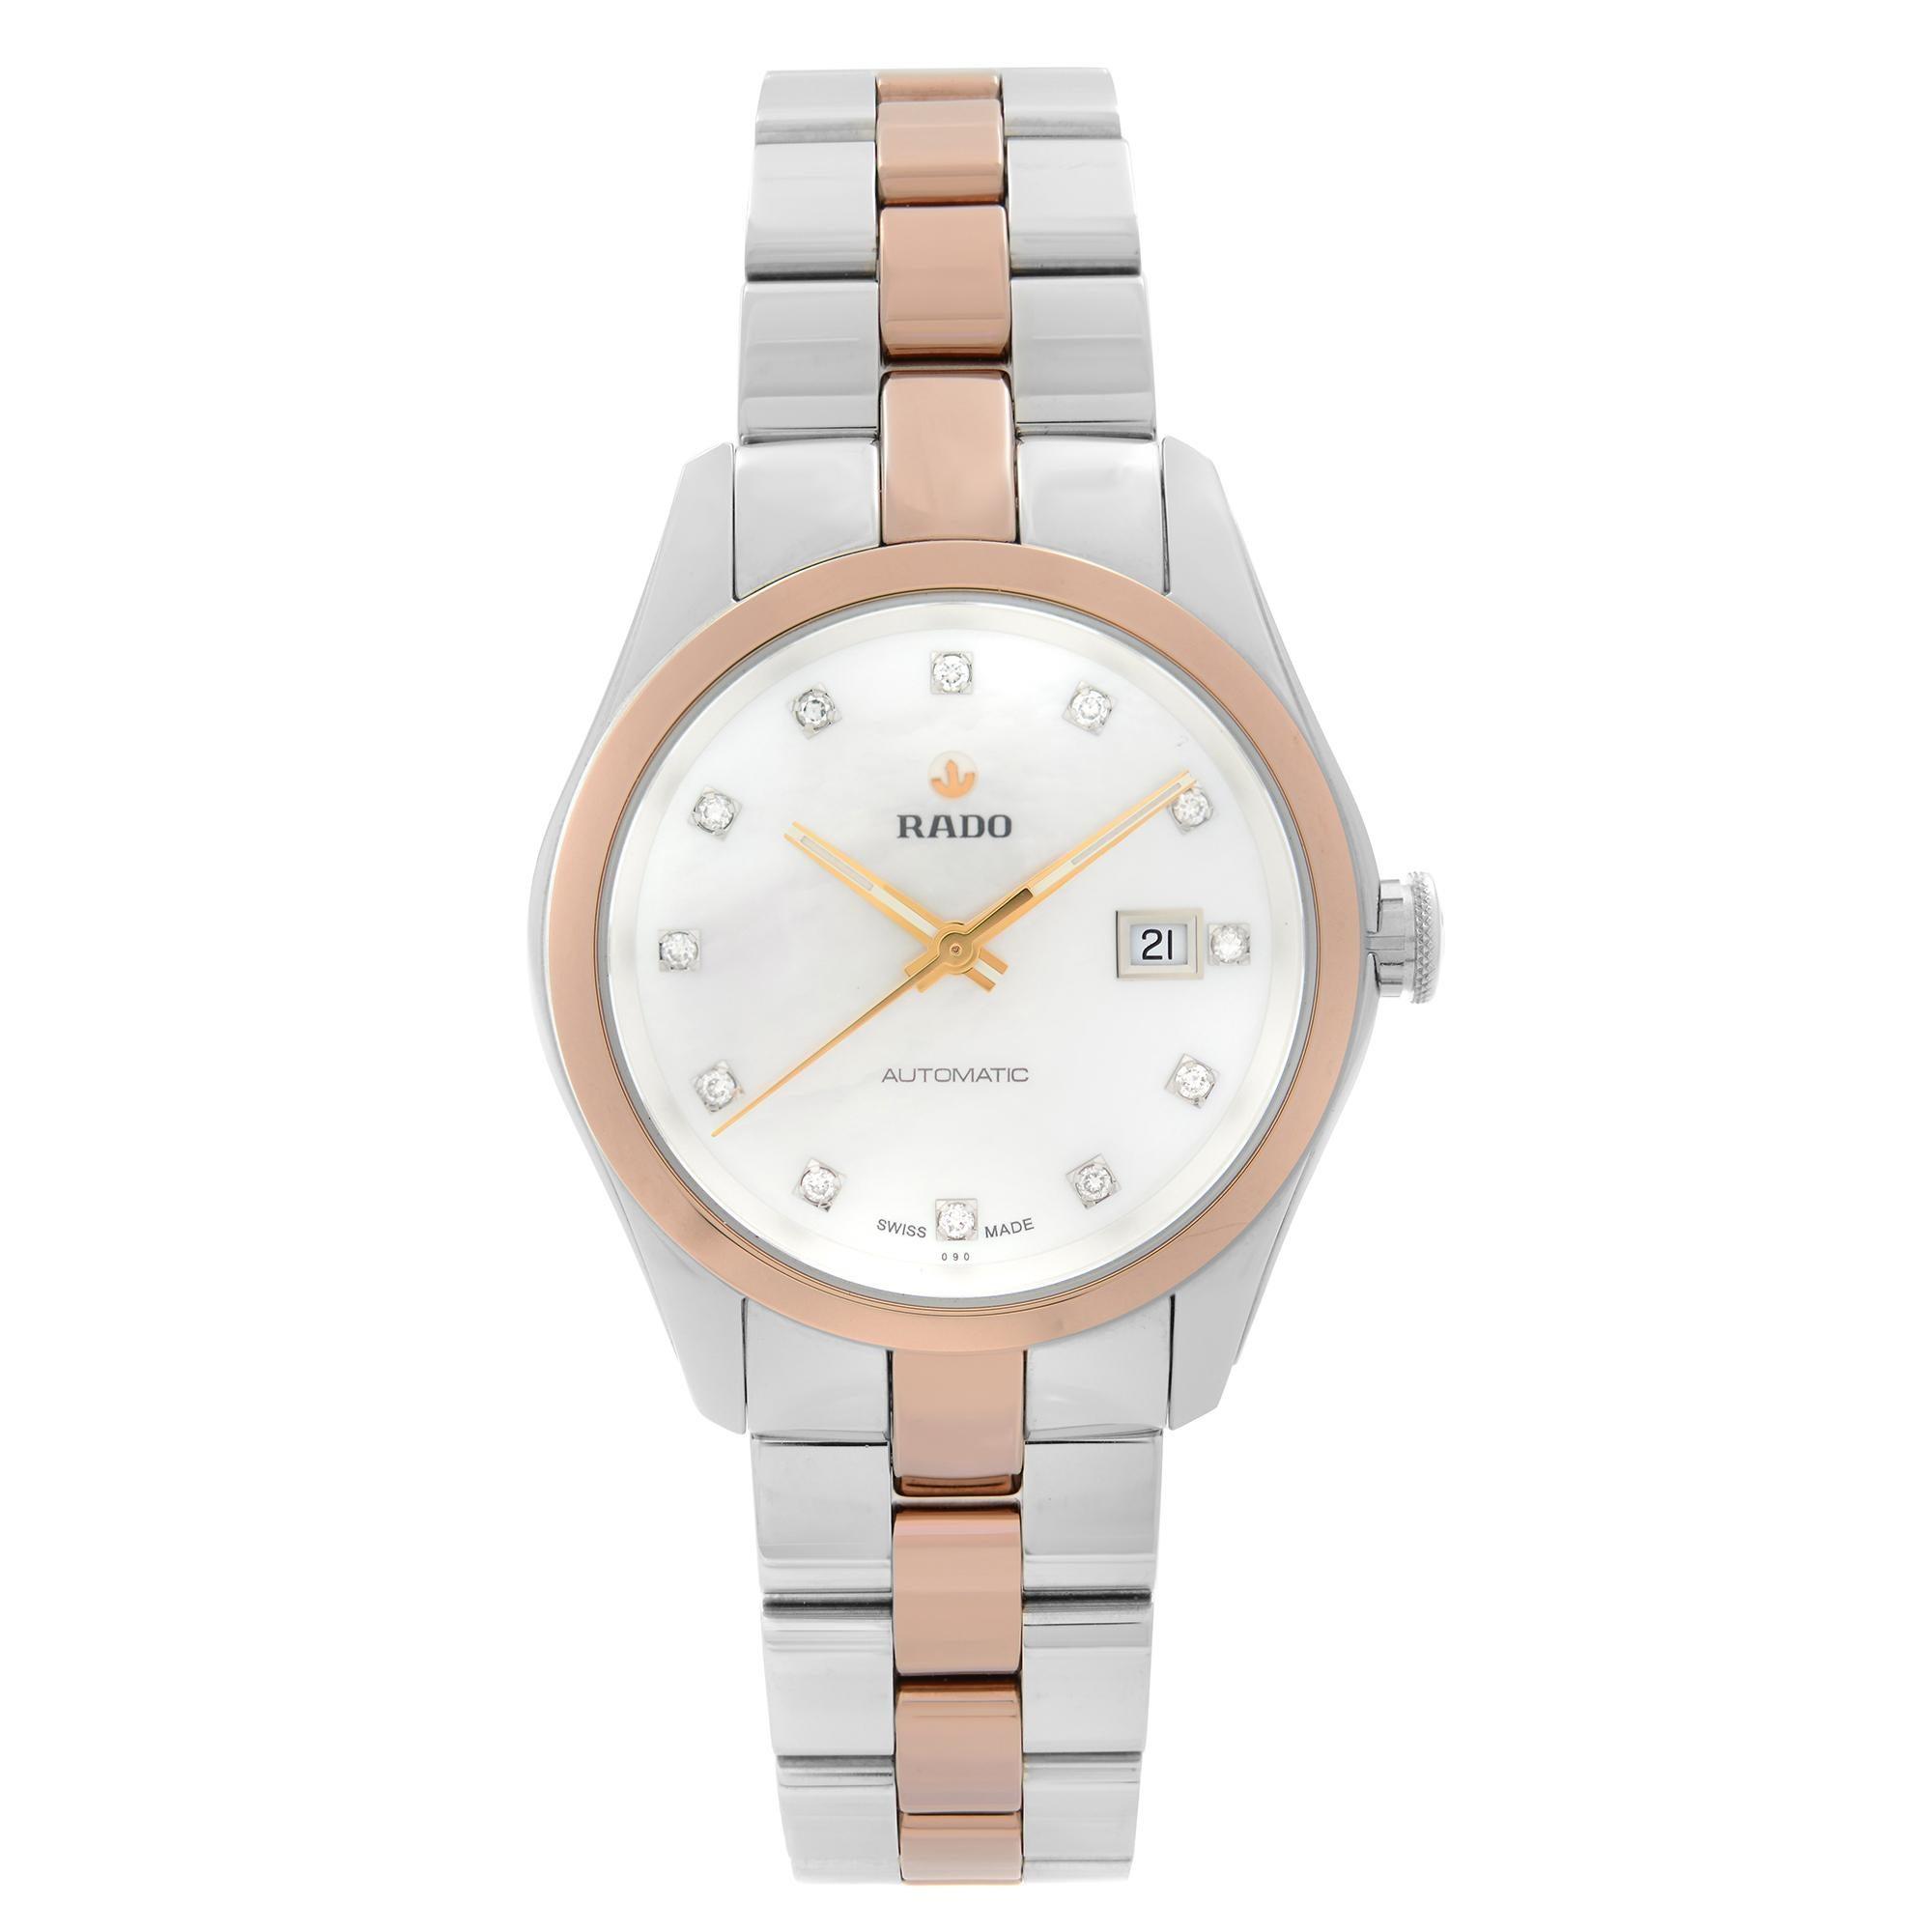 Rado Hyperchrome Steel Ceramic MOP Diamond Dial Automatic Ladies Watch R32087902